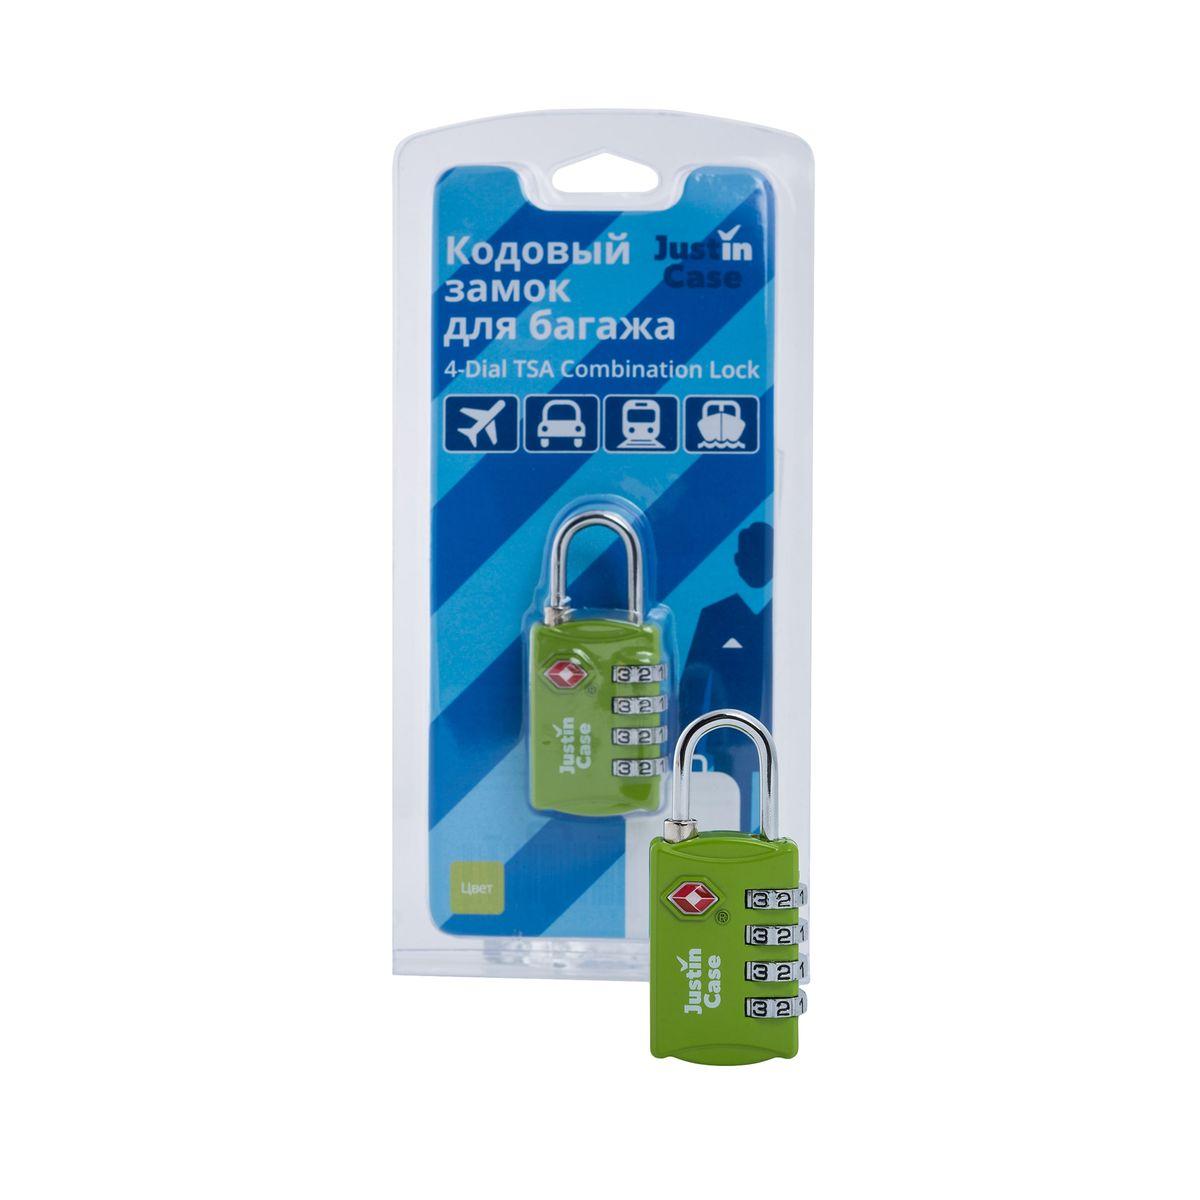 цена на Замок кодовый для багажа JustinCase 4-Dial TSA Combination Lock, цвет: зеленый